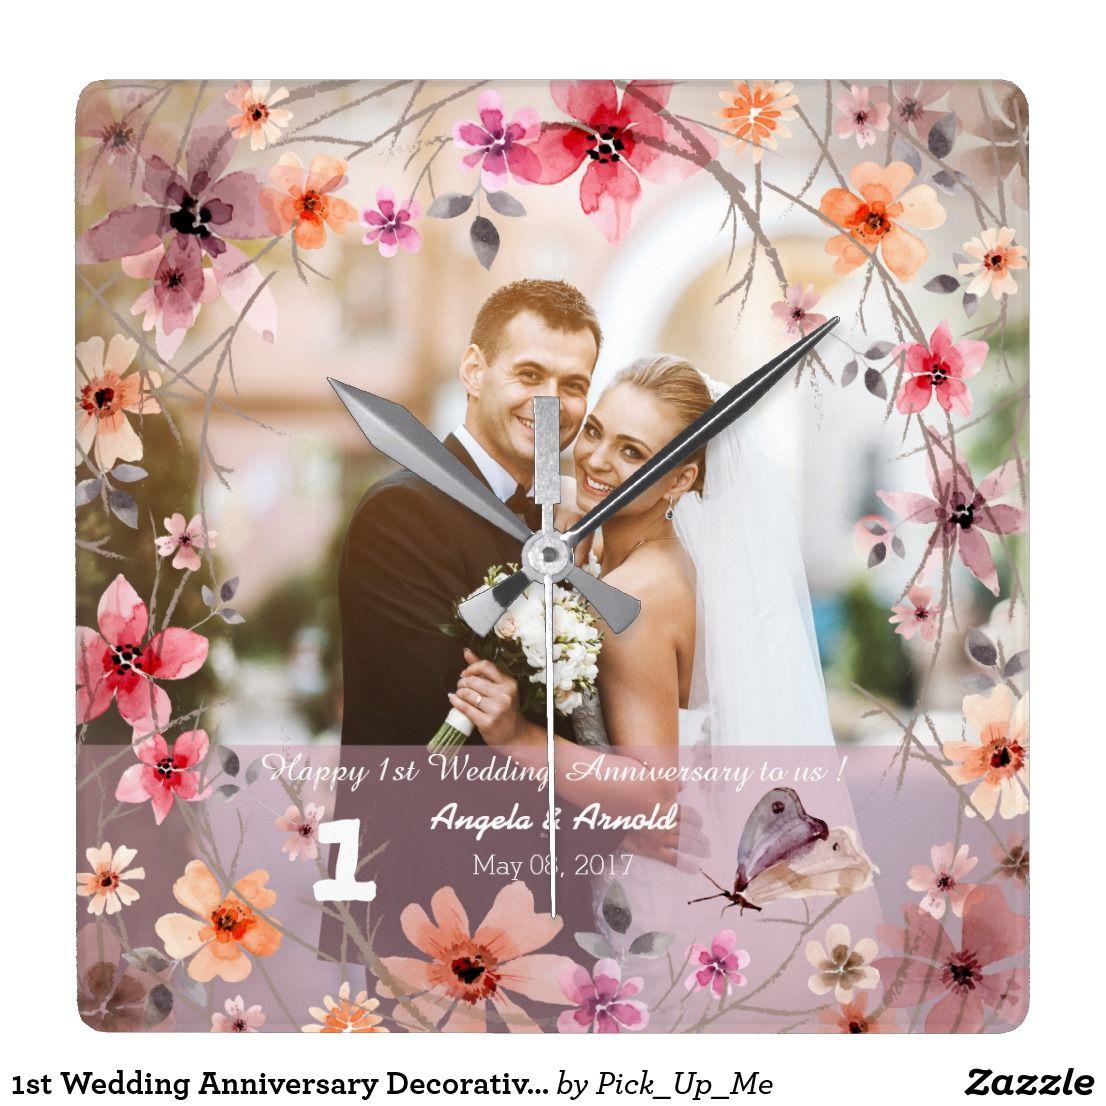 28th wedding anniversary name